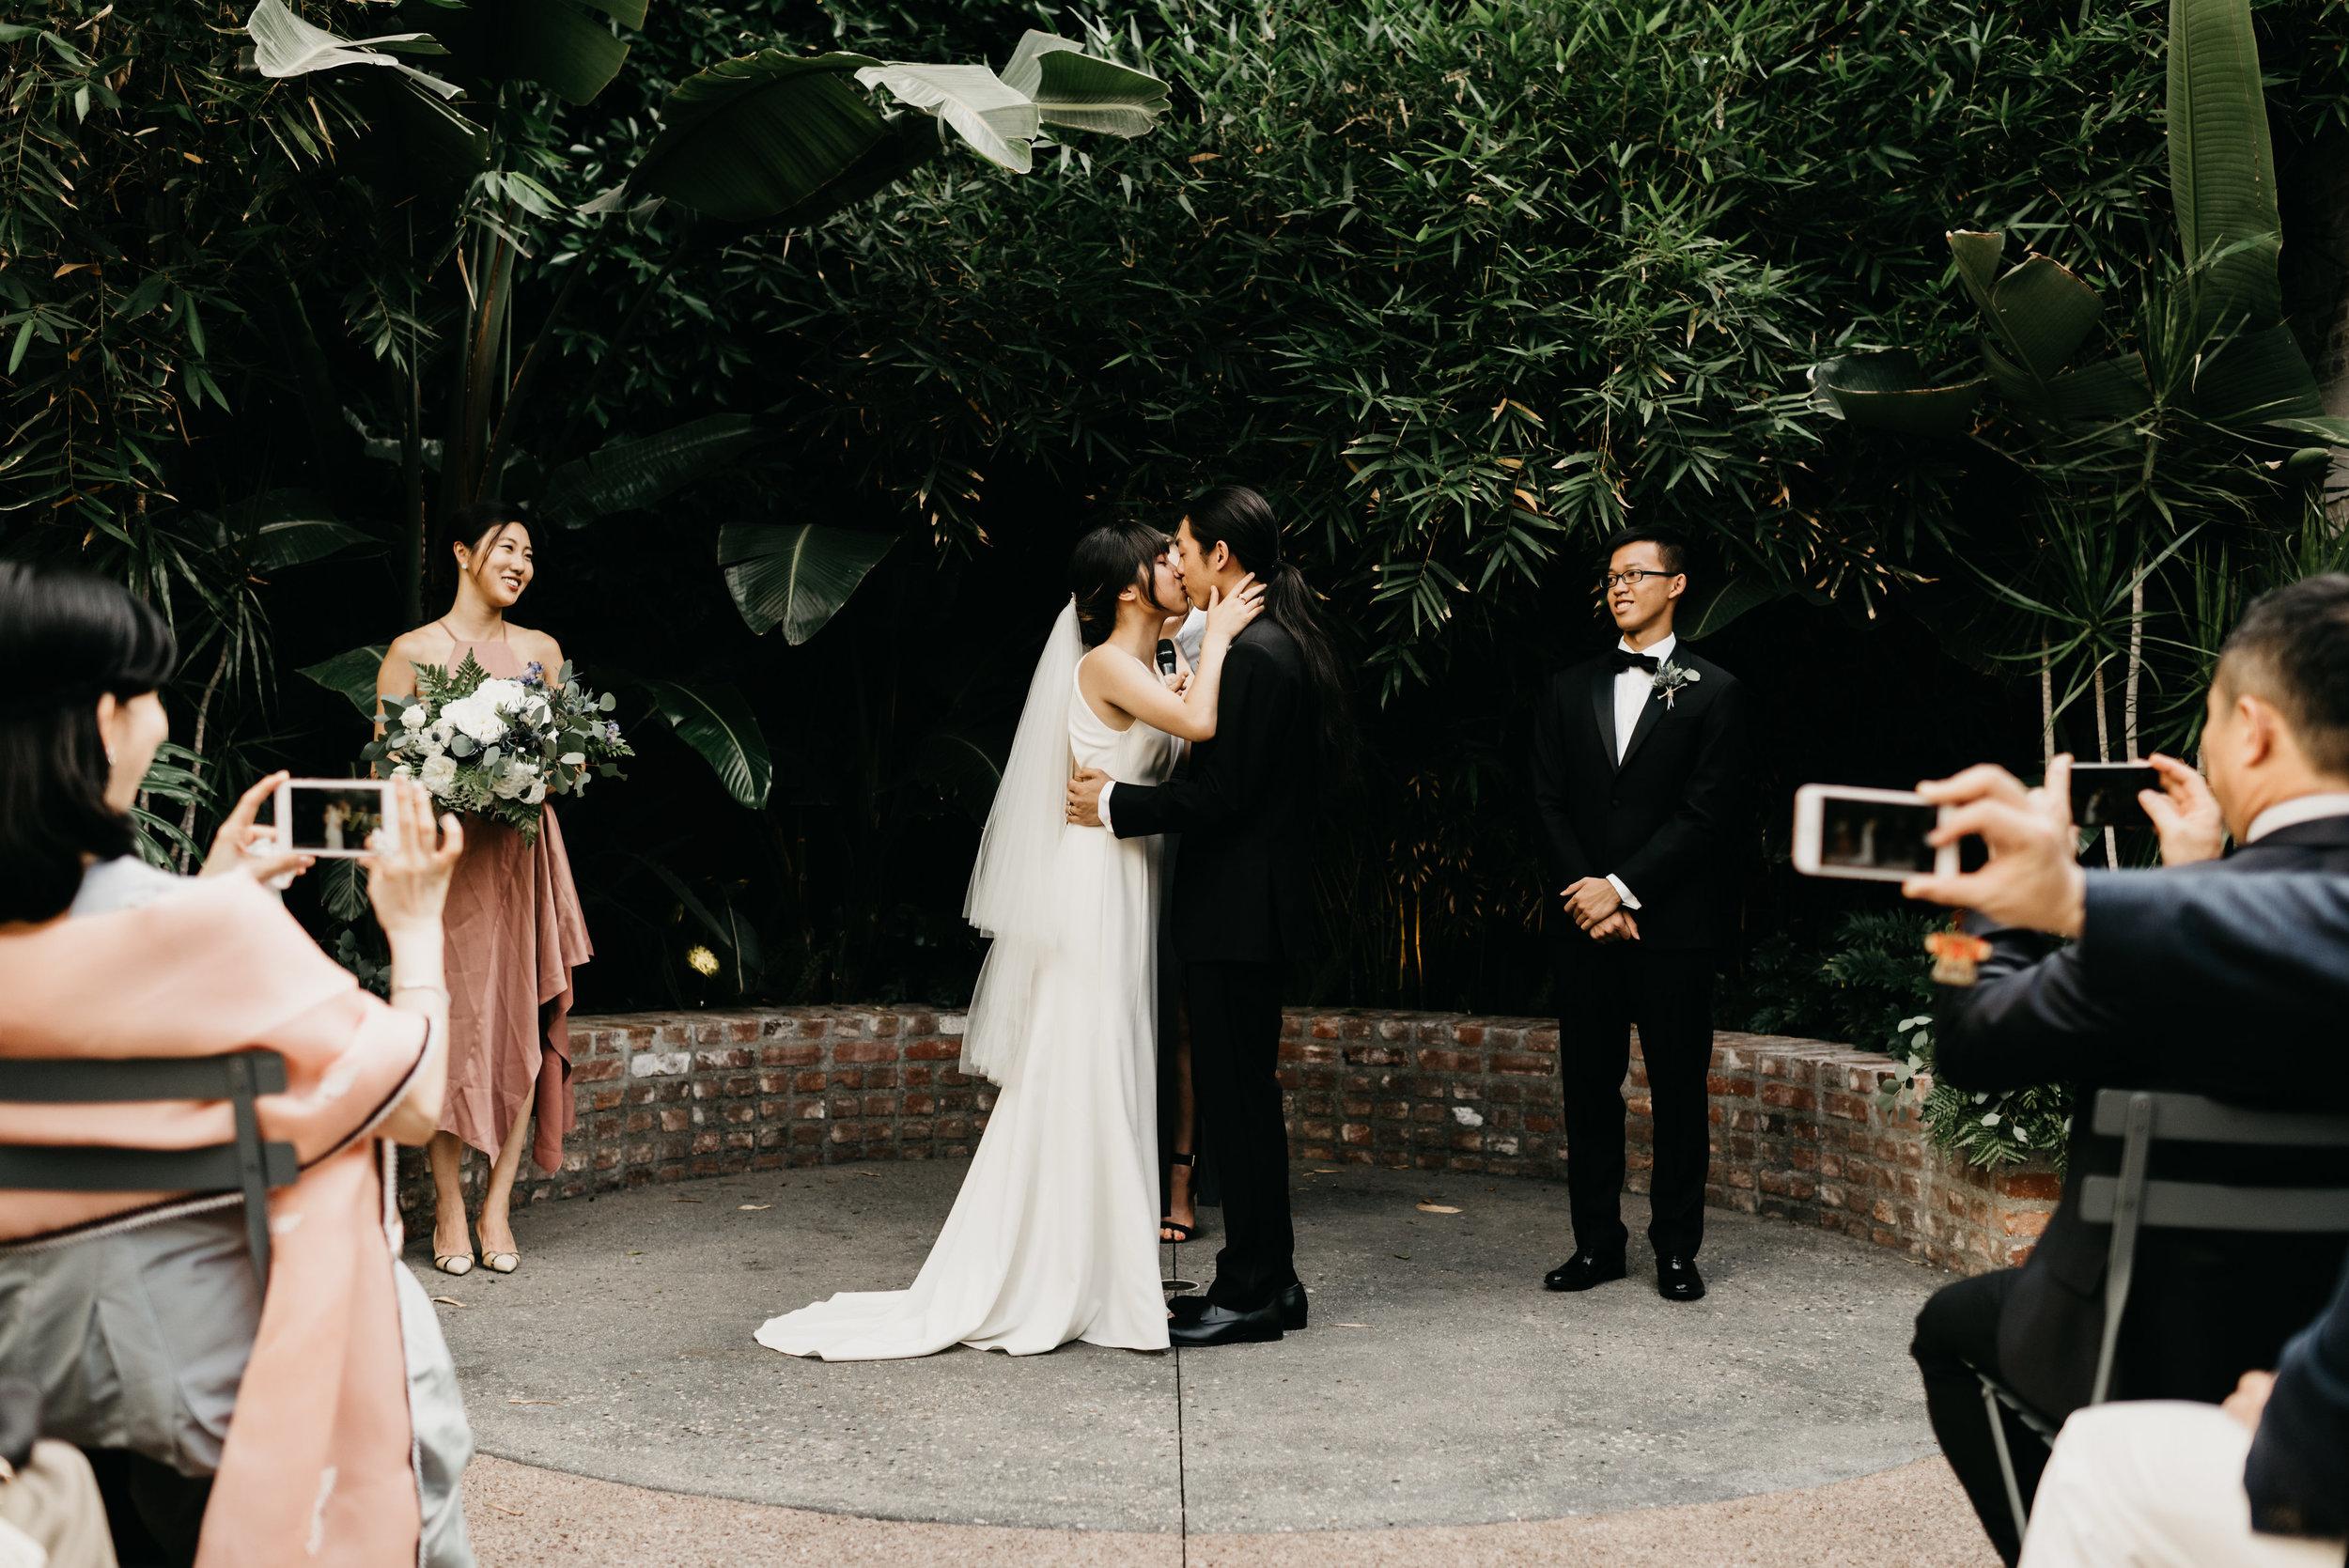 Millwick-wedding-planner71.jpg